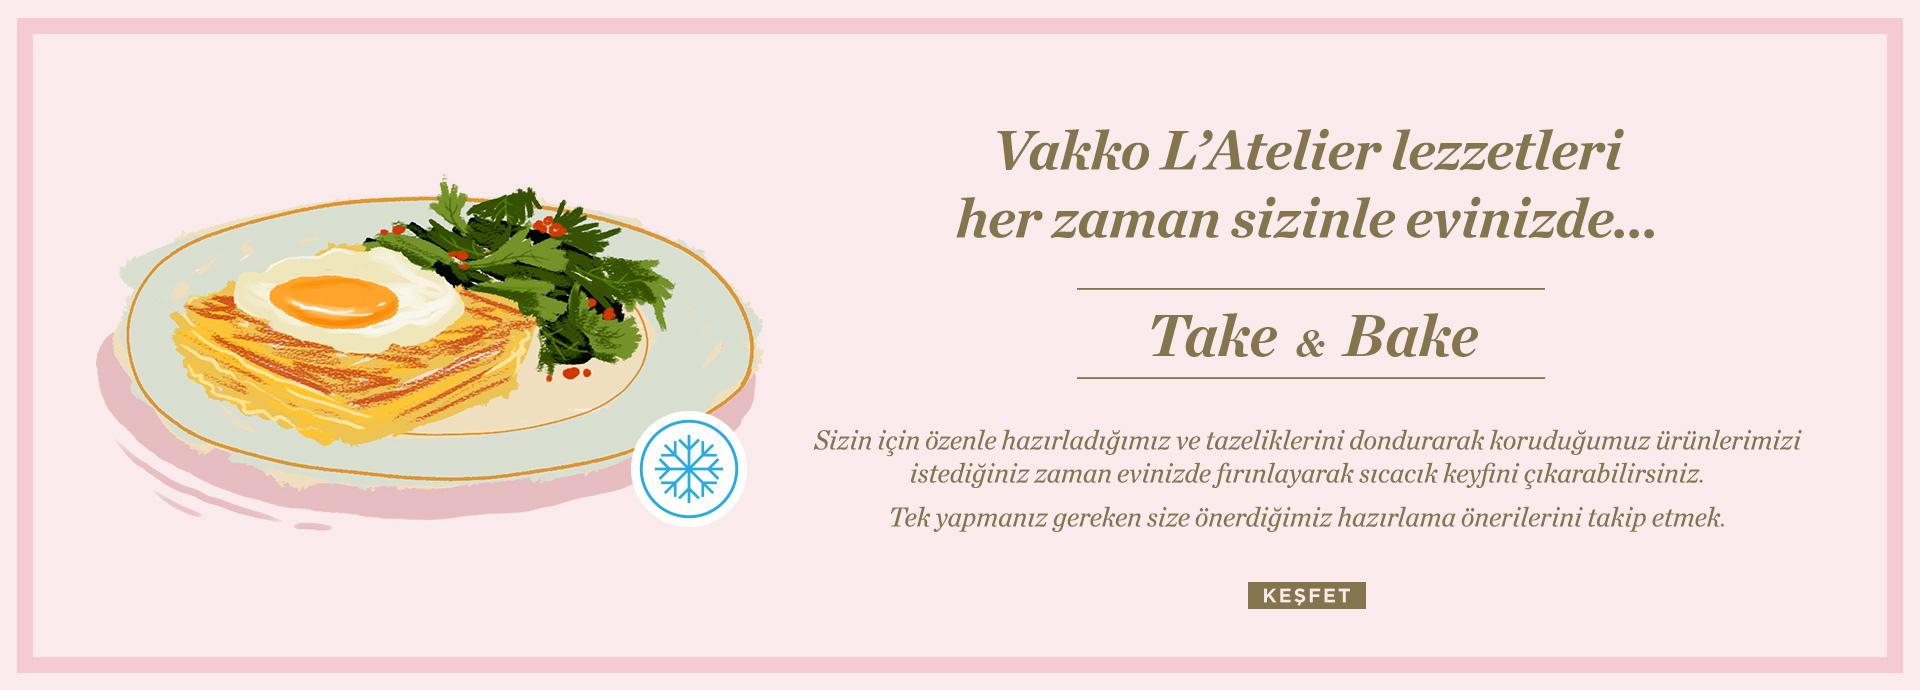 vakko_Latelier_WebBanner_1920x690